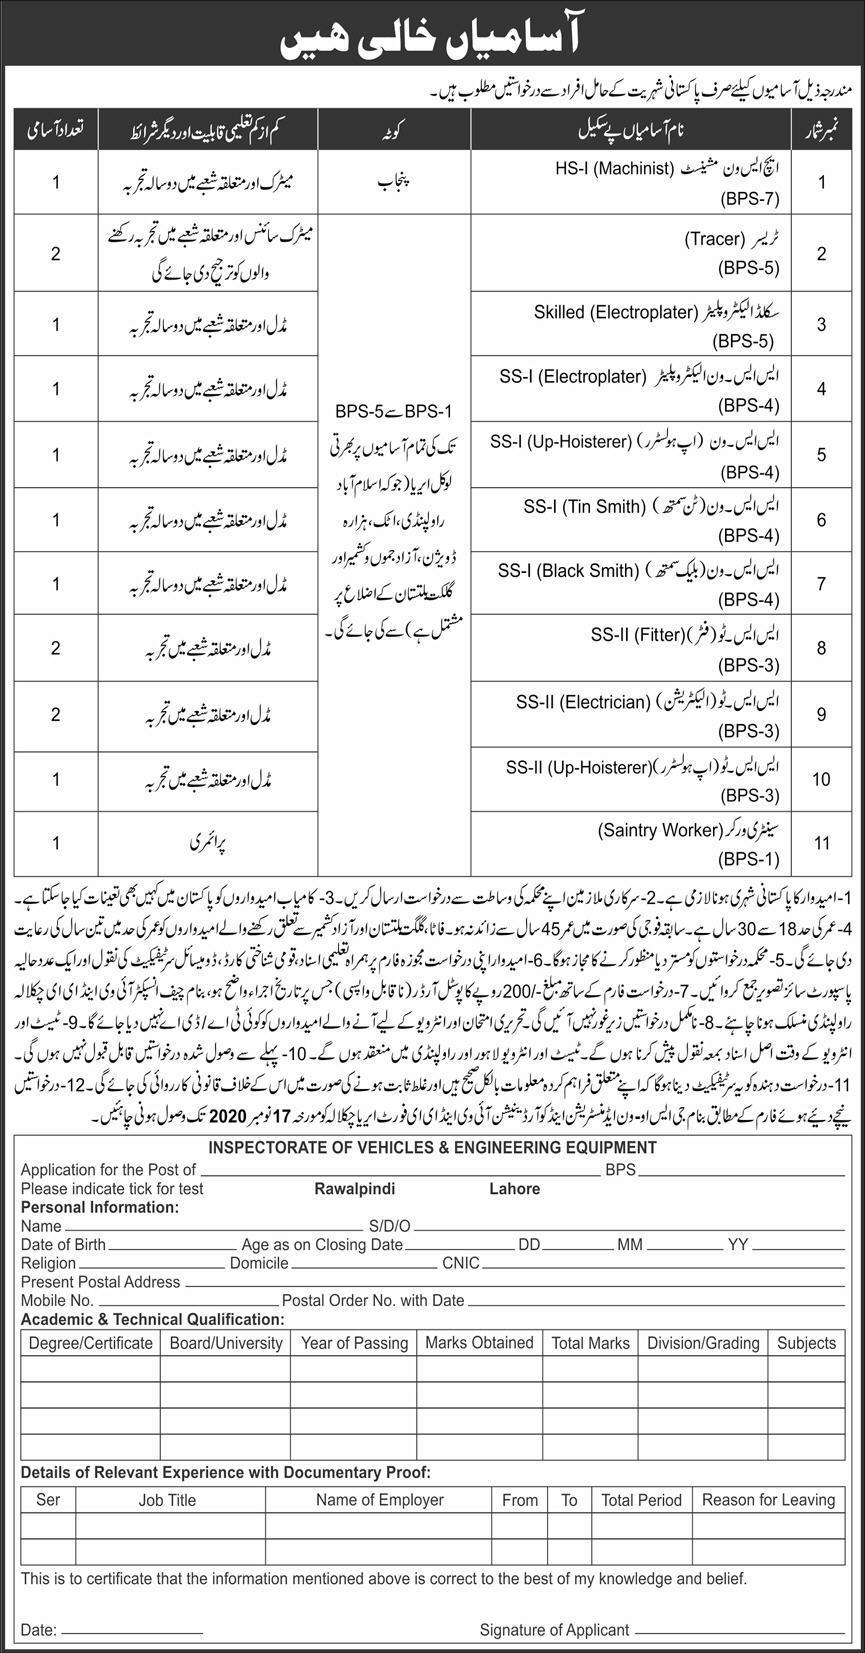 Inspectorate of Vehicles & Engineering Equipment November 2020 Jobs 2020 in Pakistan - Download Job Application Form